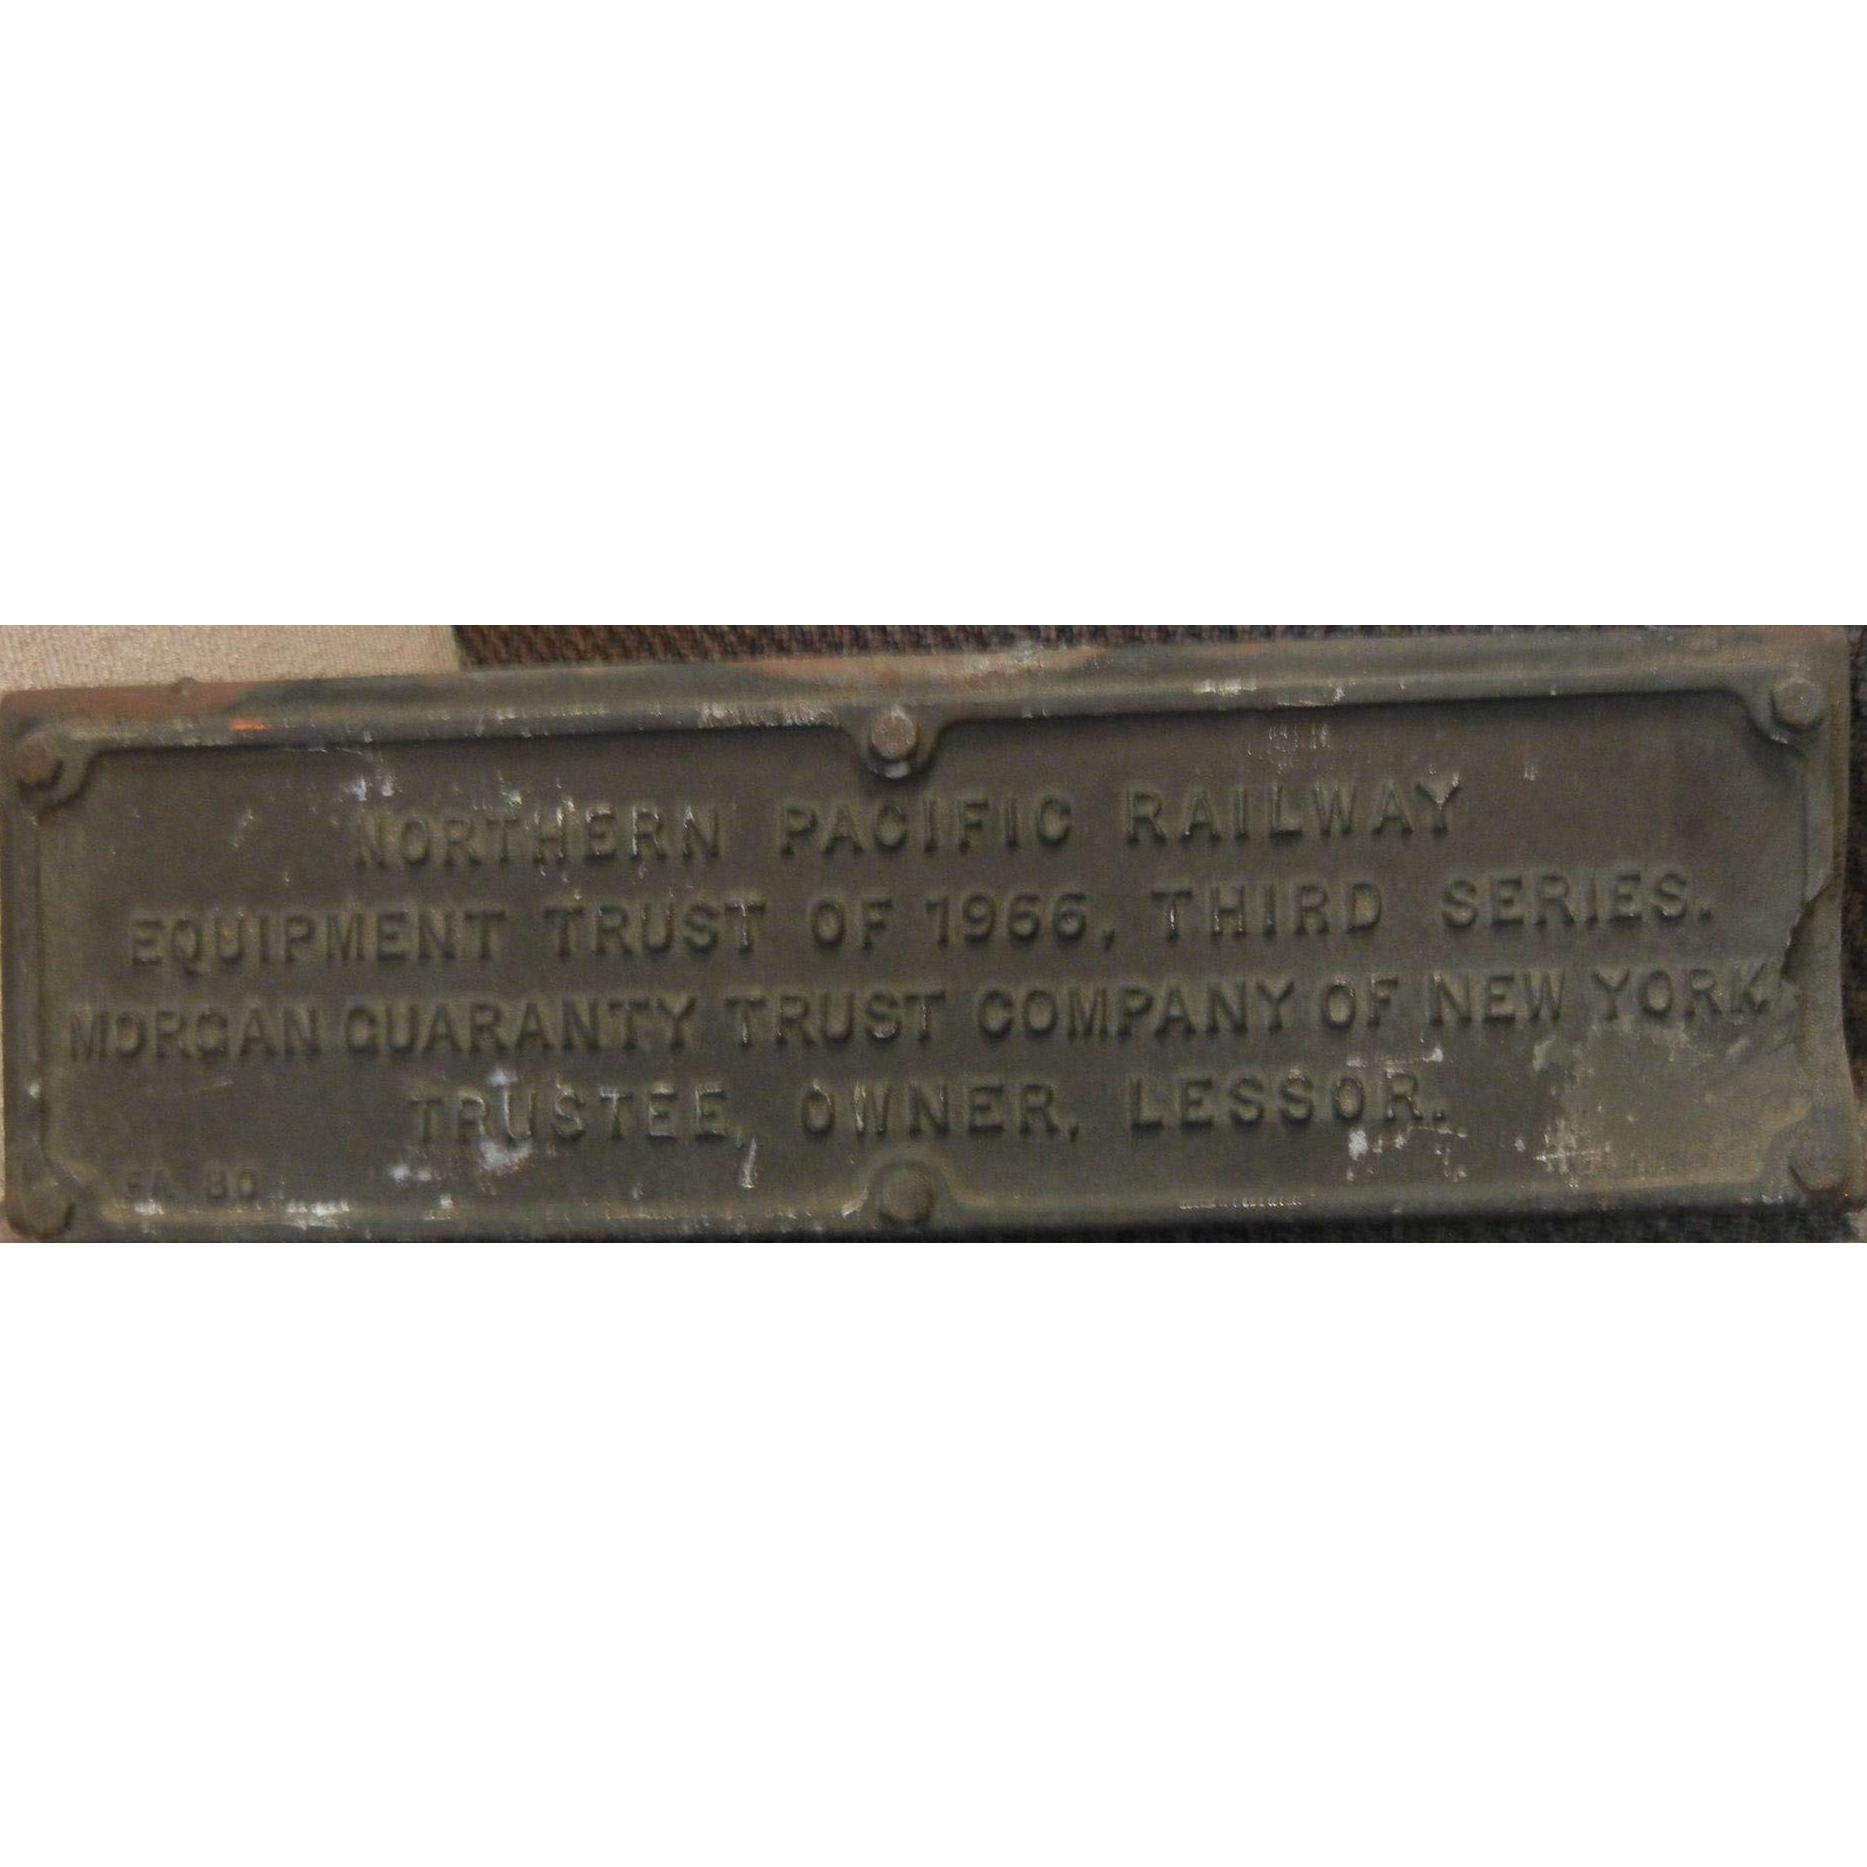 Vintage Original 1966 Northern Pacific Railway Third Series Equipment Trust